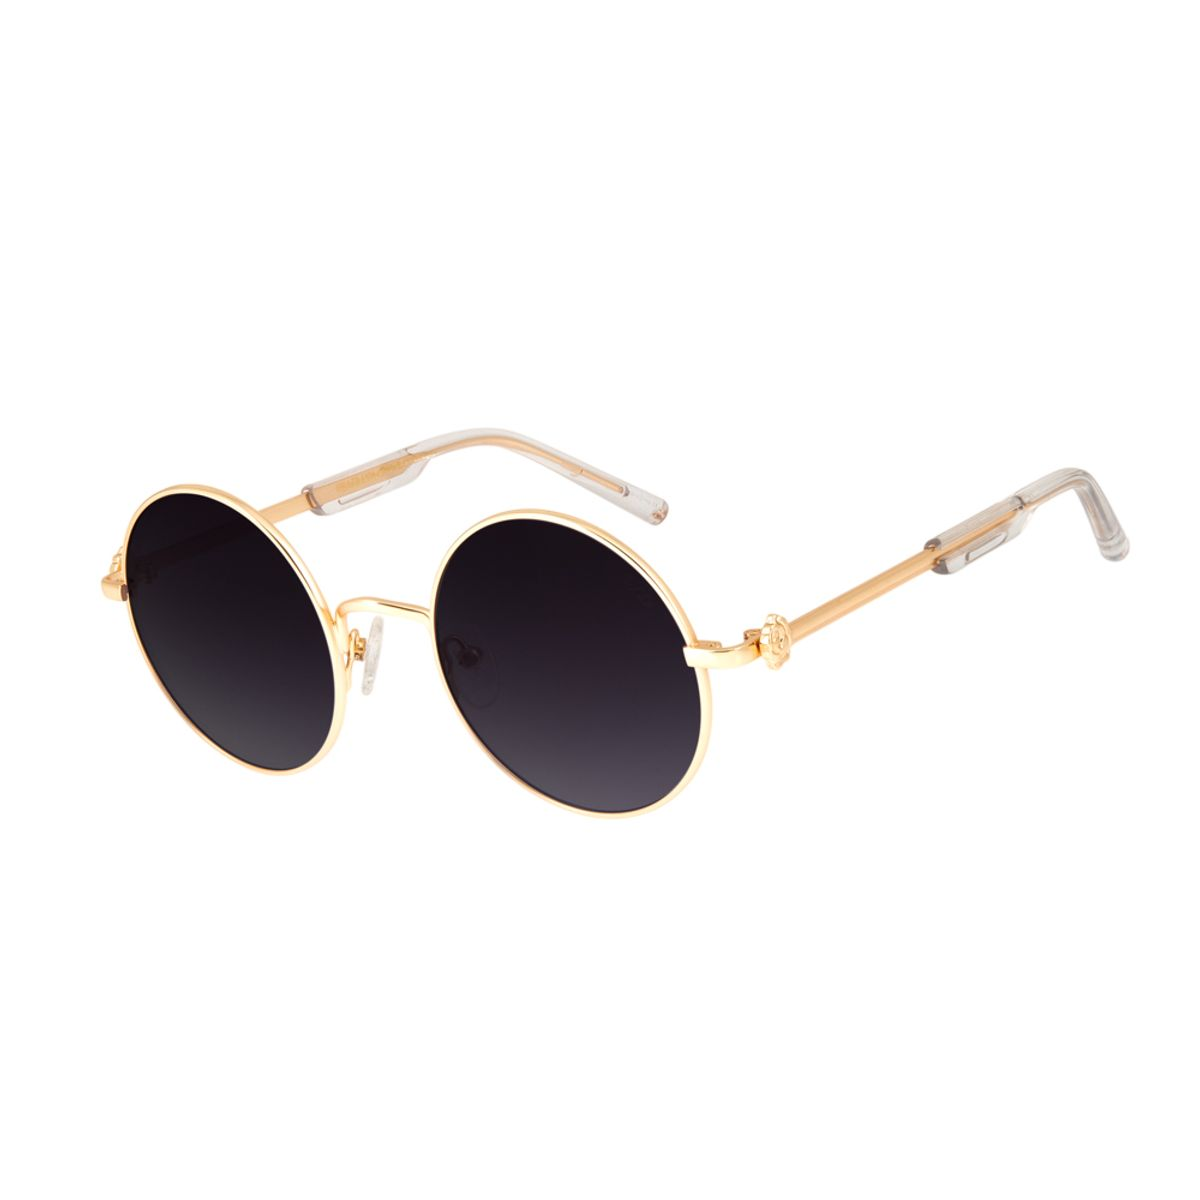 8c92adc460e17 Óculos de Sol Chilli Beans Feminino Arte de Rua Crânio 2622 - Chilli ...